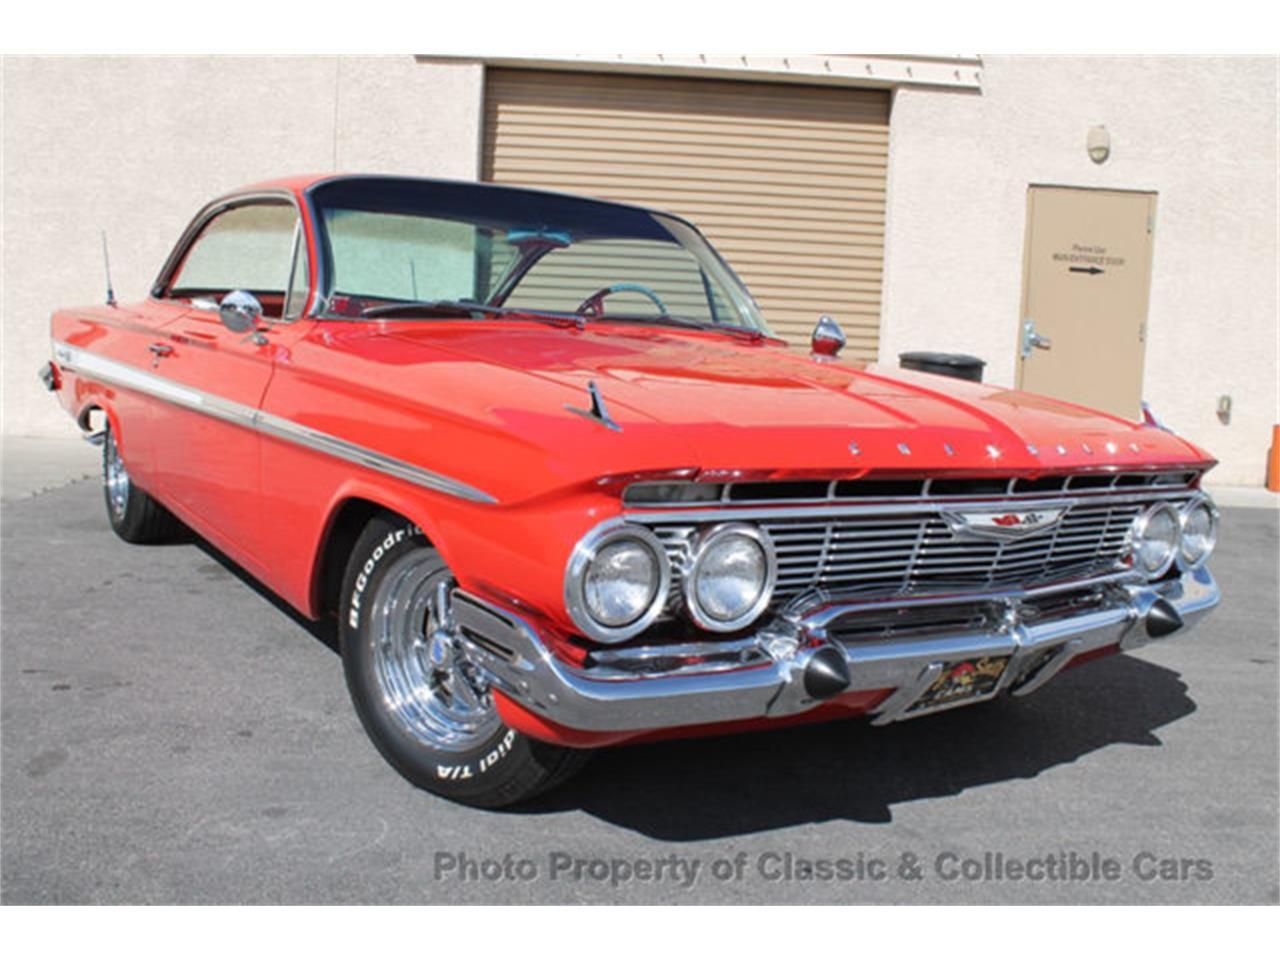 1961 Chevrolet Impala (CC-1206064) for sale in Las Vegas, Nevada